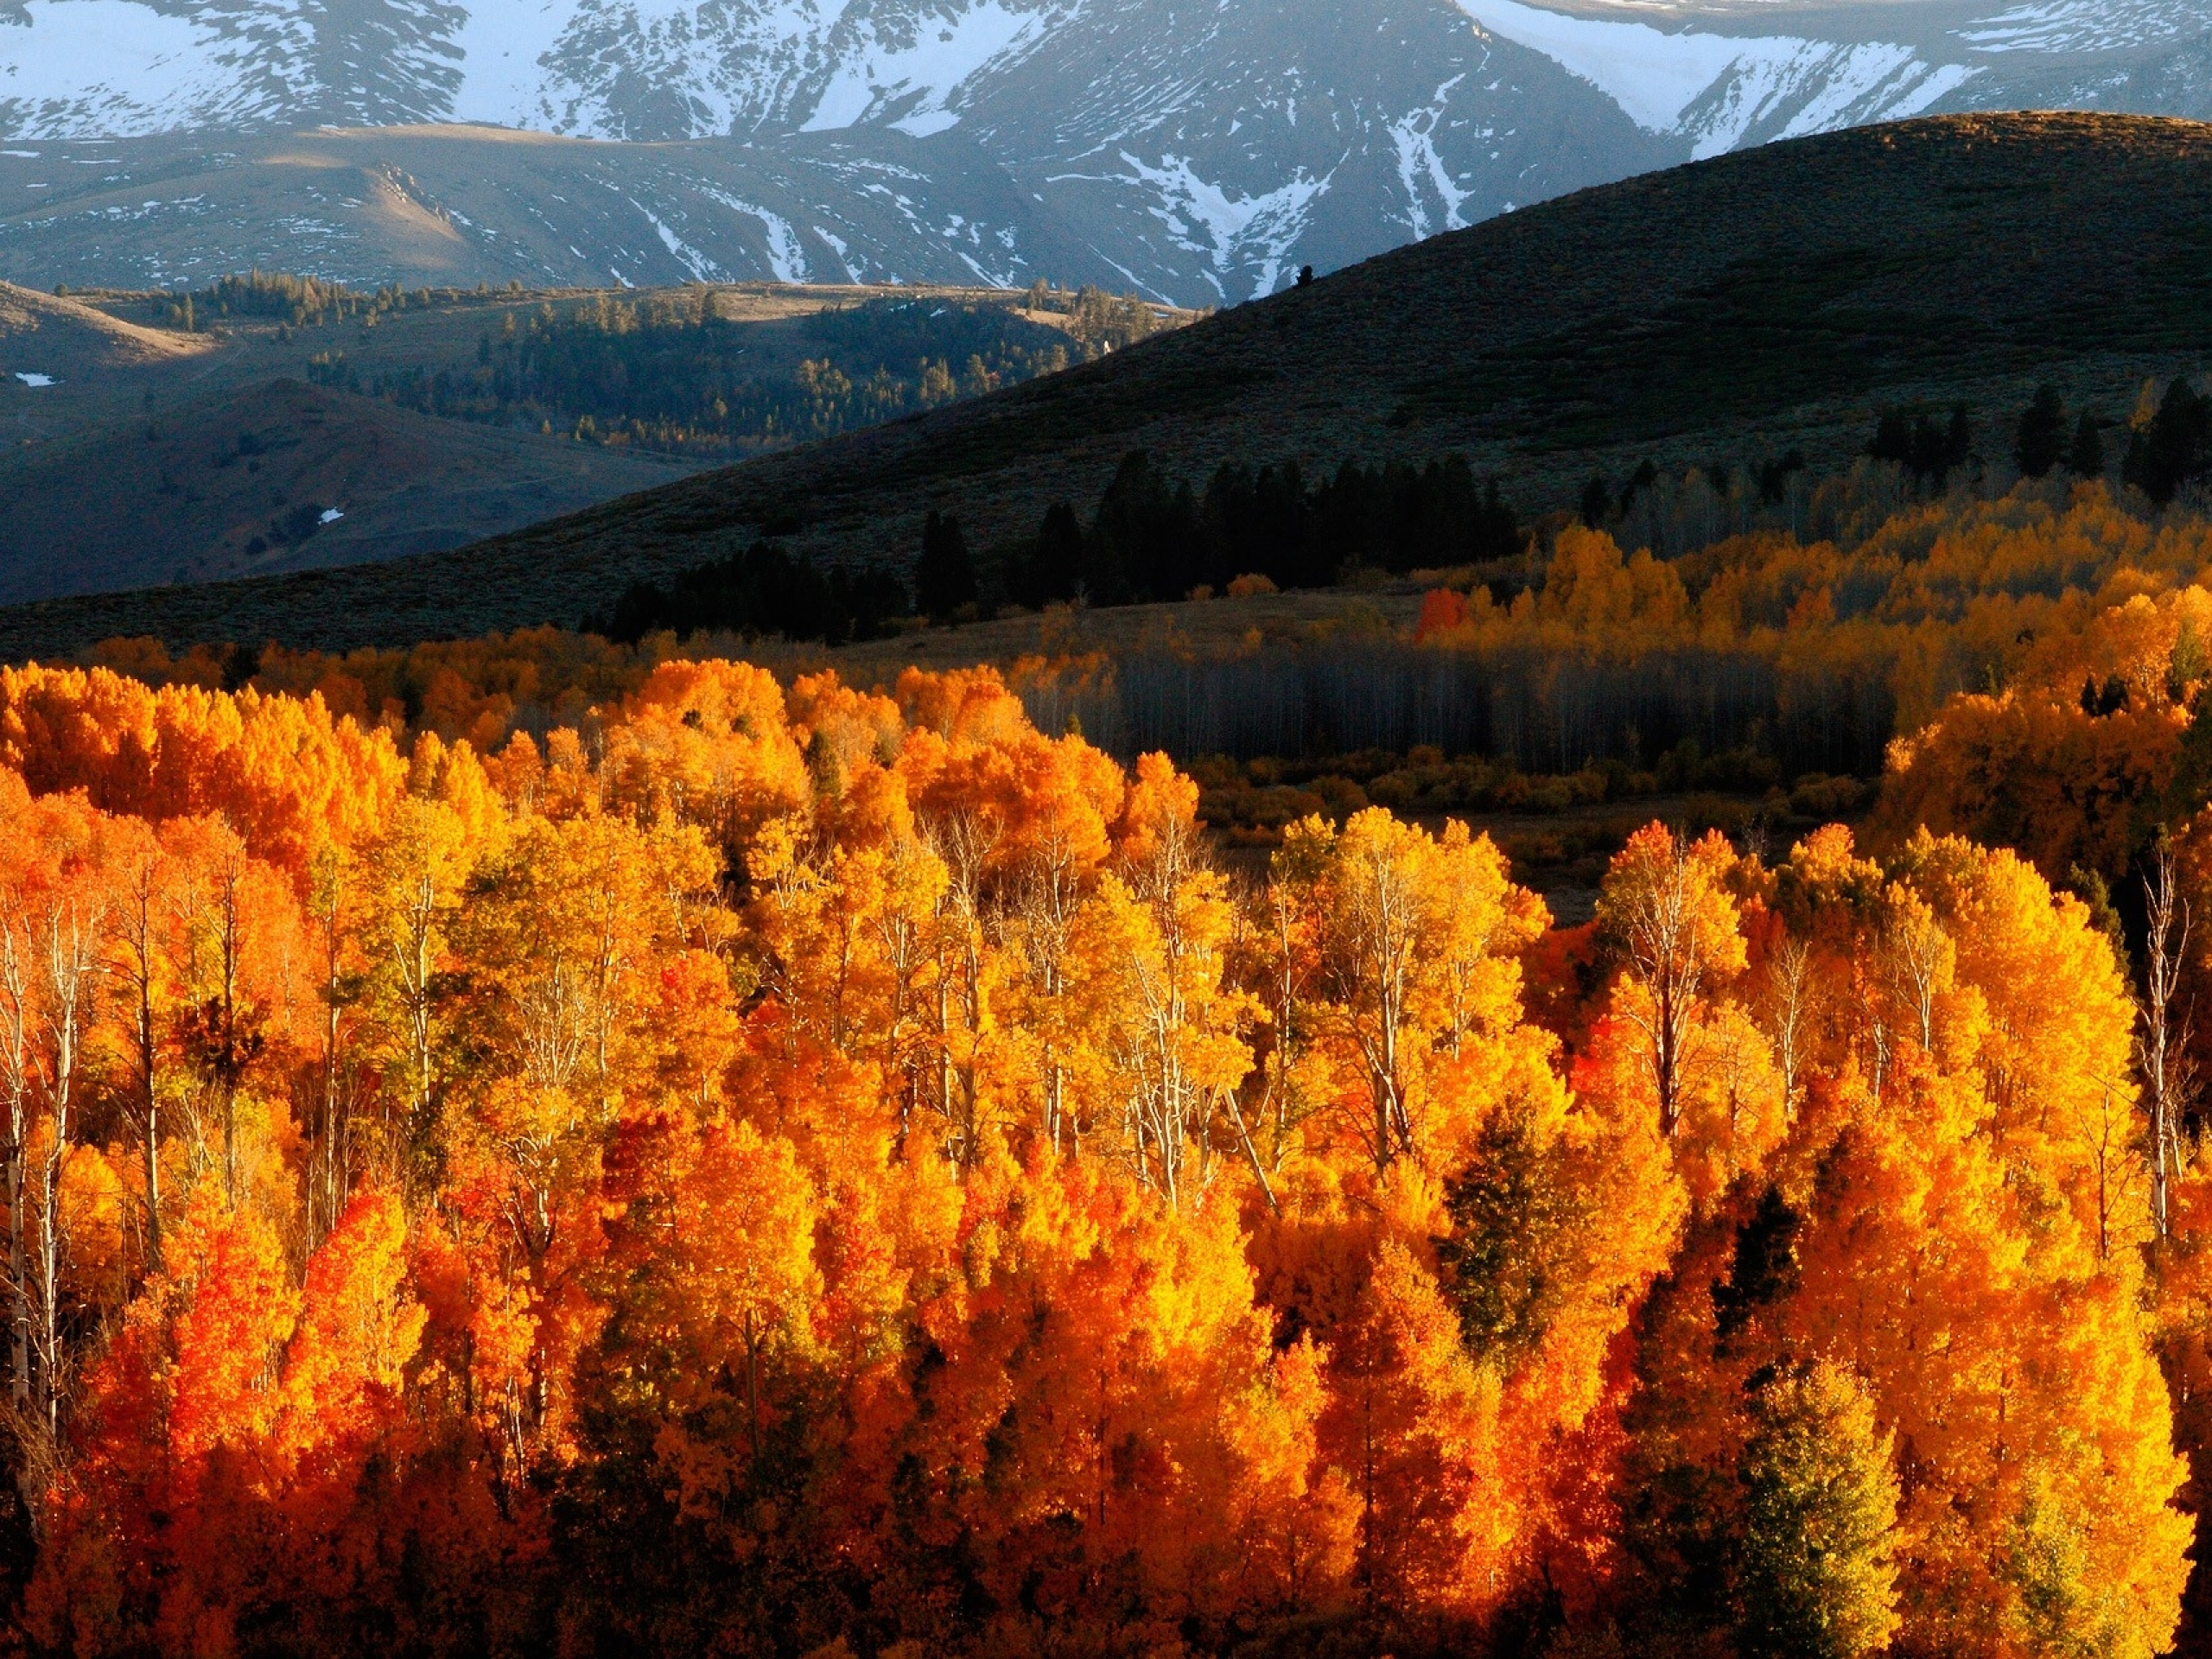 Autumn Forest Hills Snow wallpapers Autumn Forest Hills Snow 2560x1920